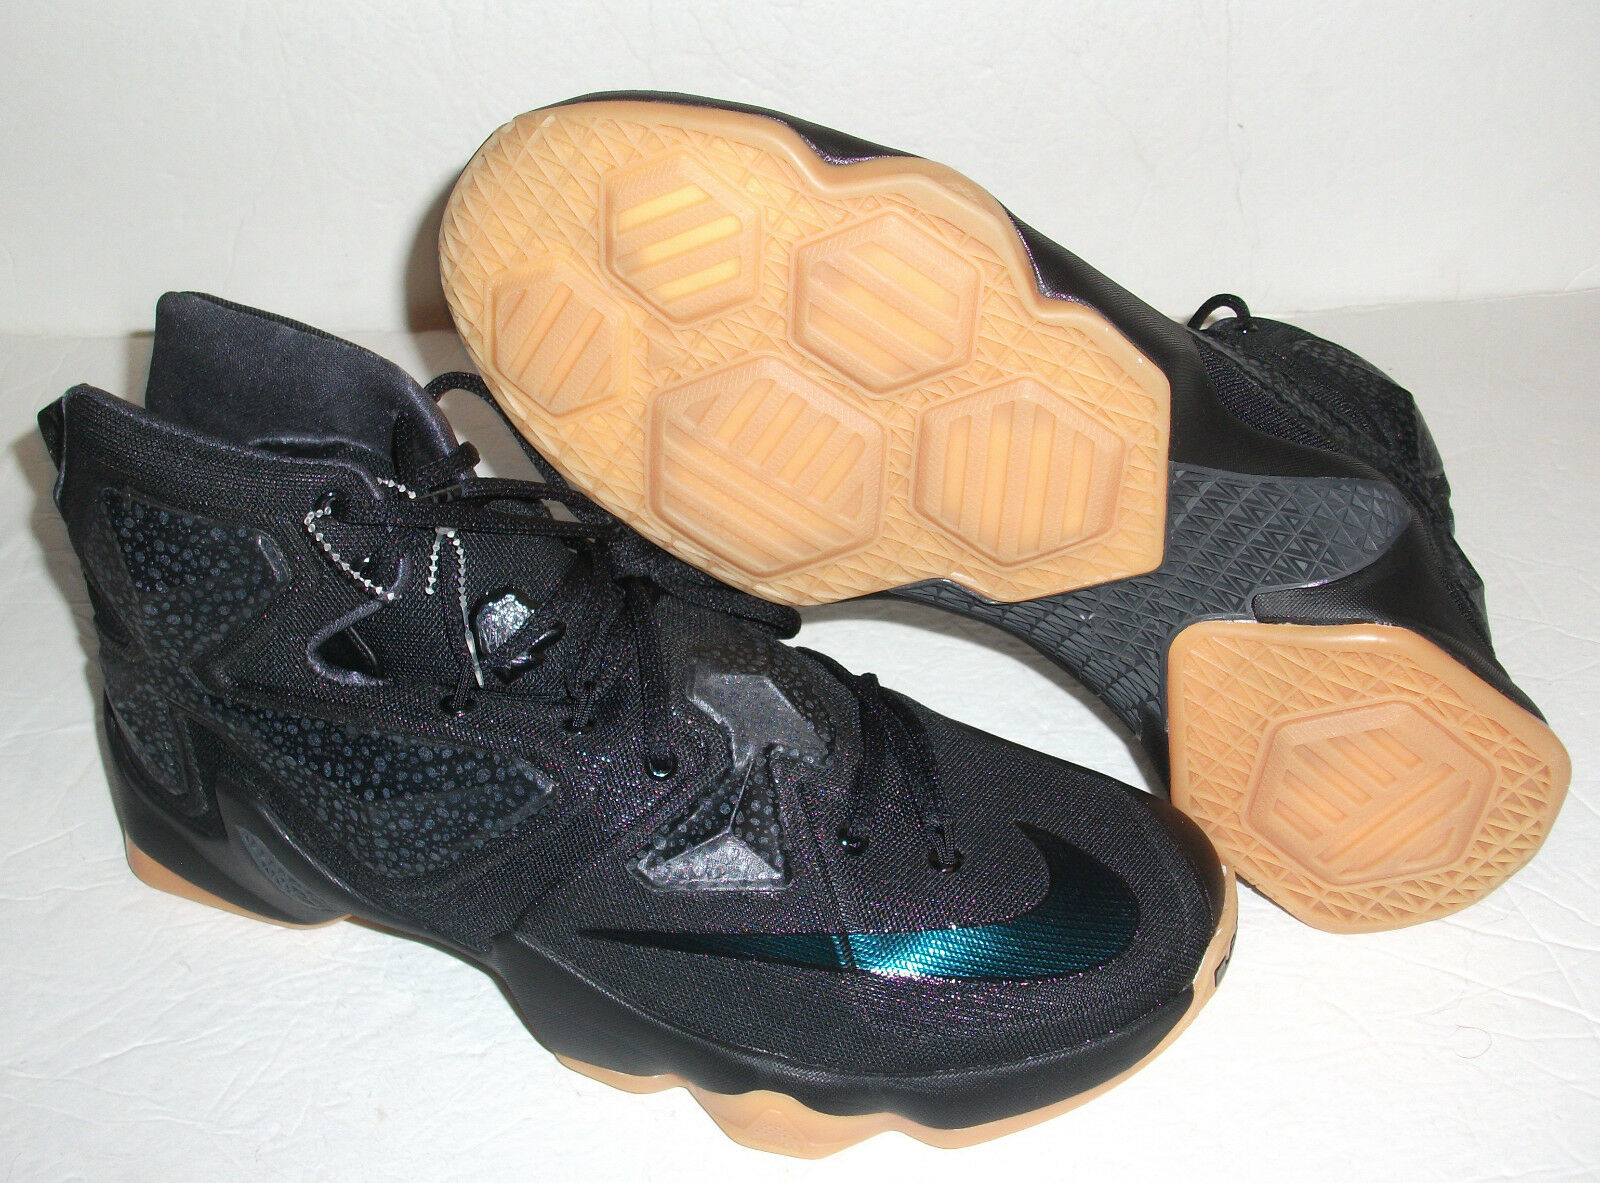 Nike LeBron 13 XIII Black Lion Basketball, Men's Size 11.5, Black, 807219 001